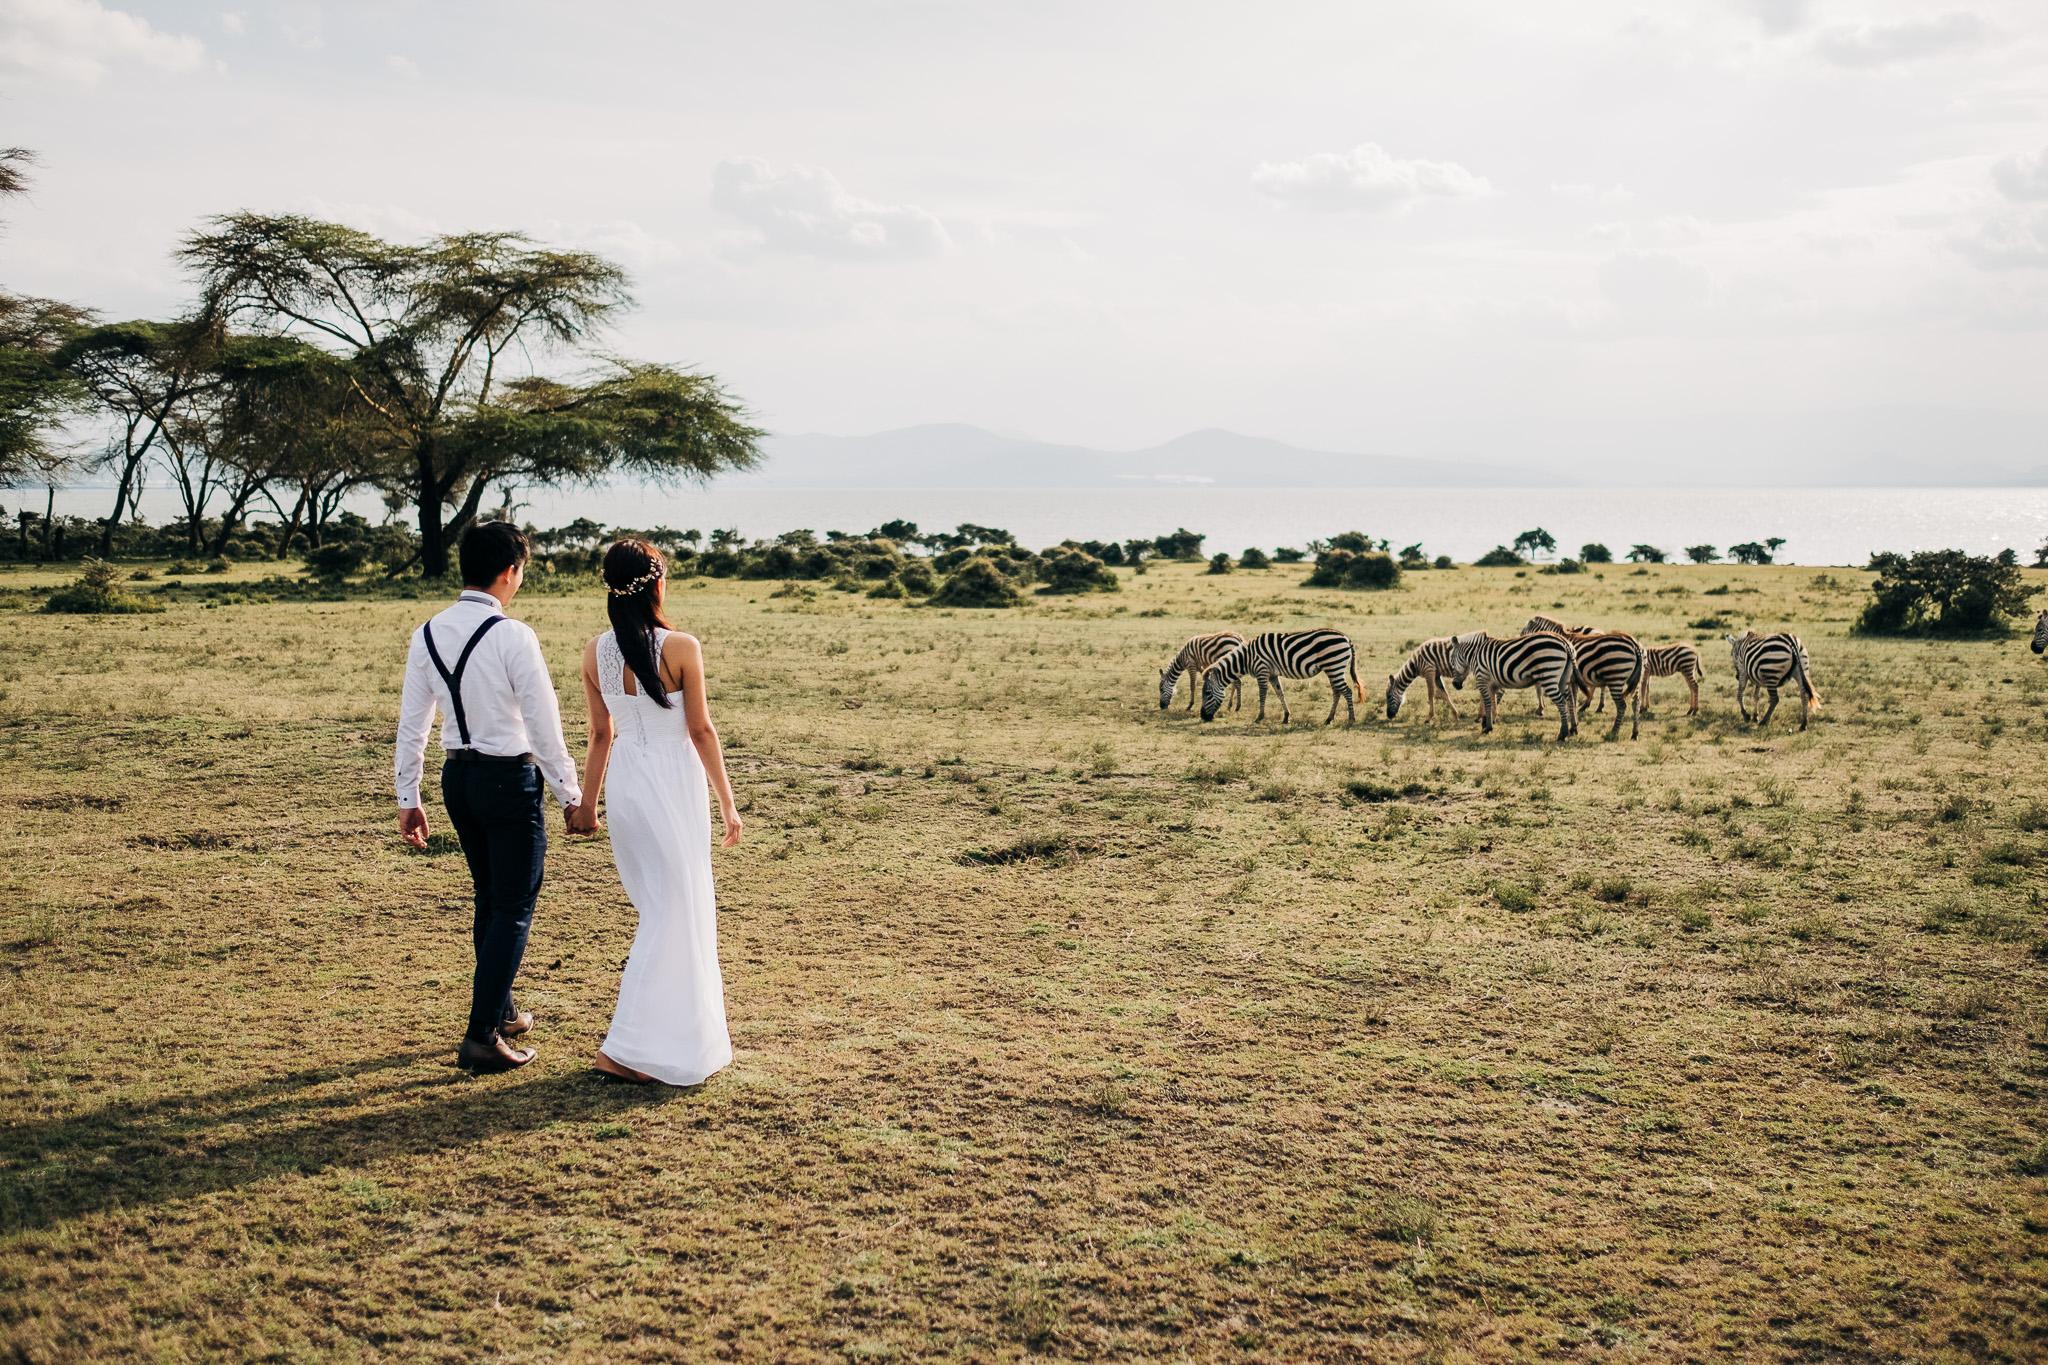 Anna-Hari-Photography-Safari-Elopement-Kenya-Wedding-Photographer-Kenya-61.jpg